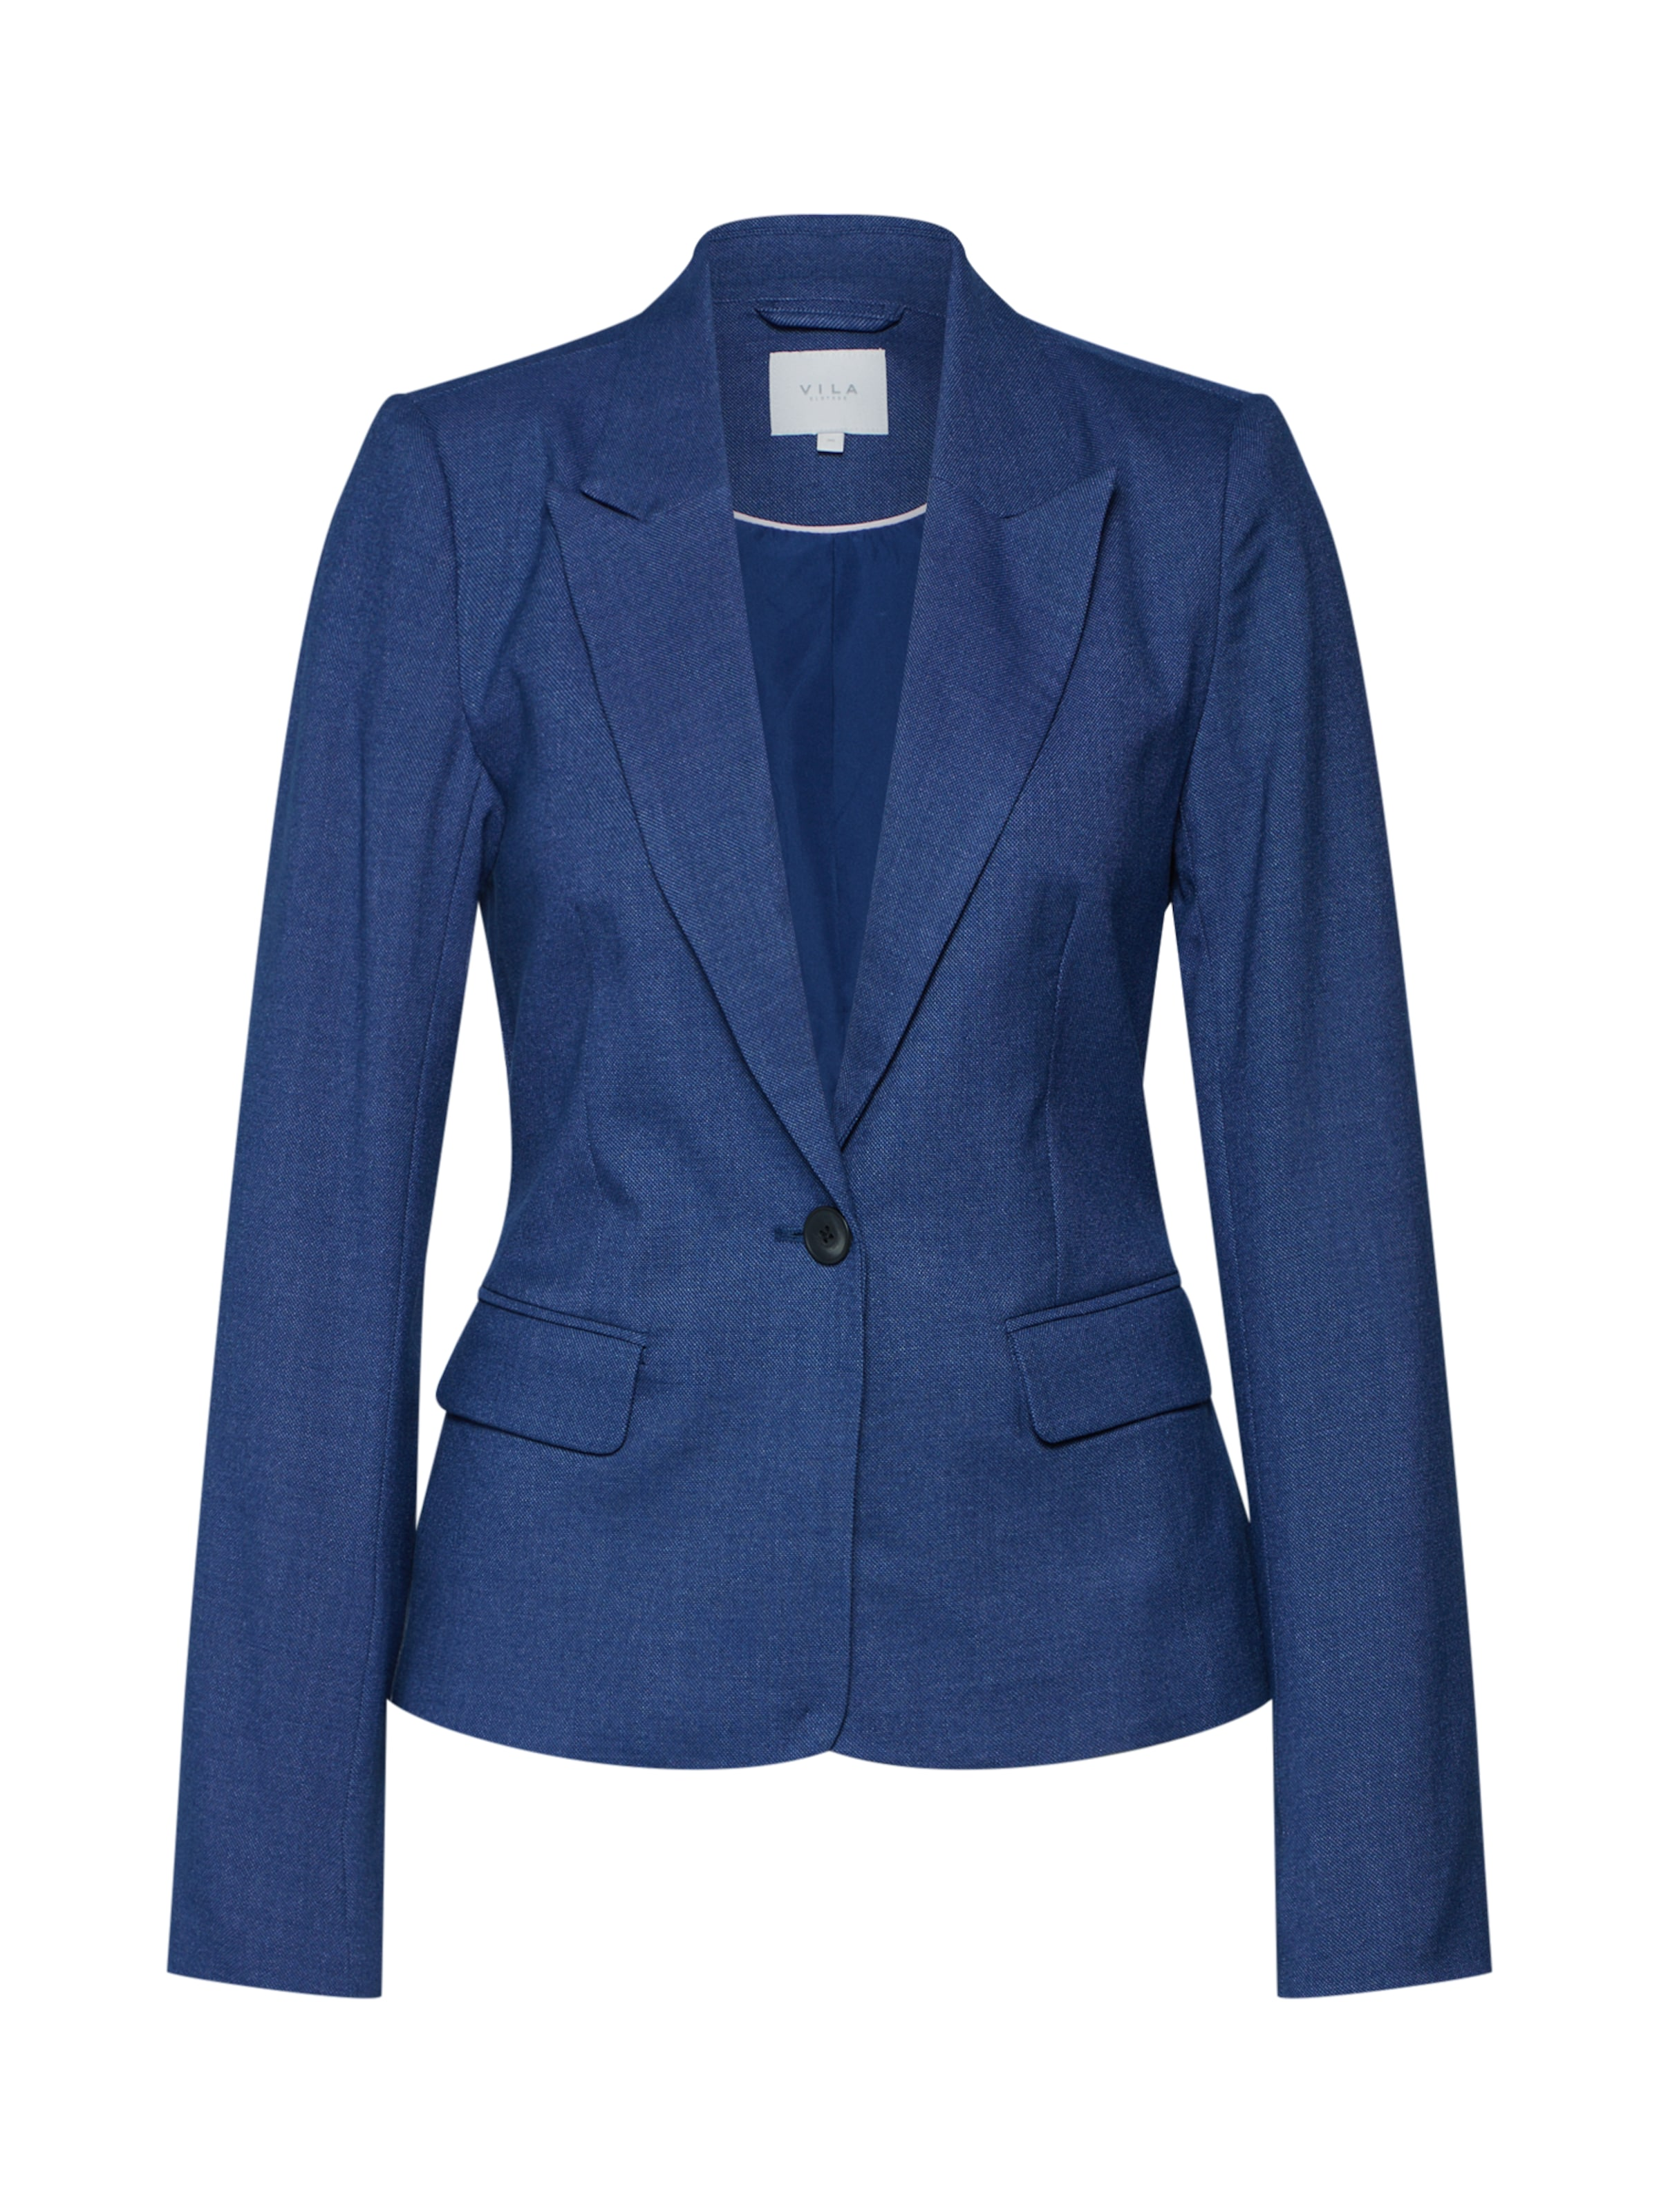 Vila Denim 'dean' In Blue Blazer wPnk0O